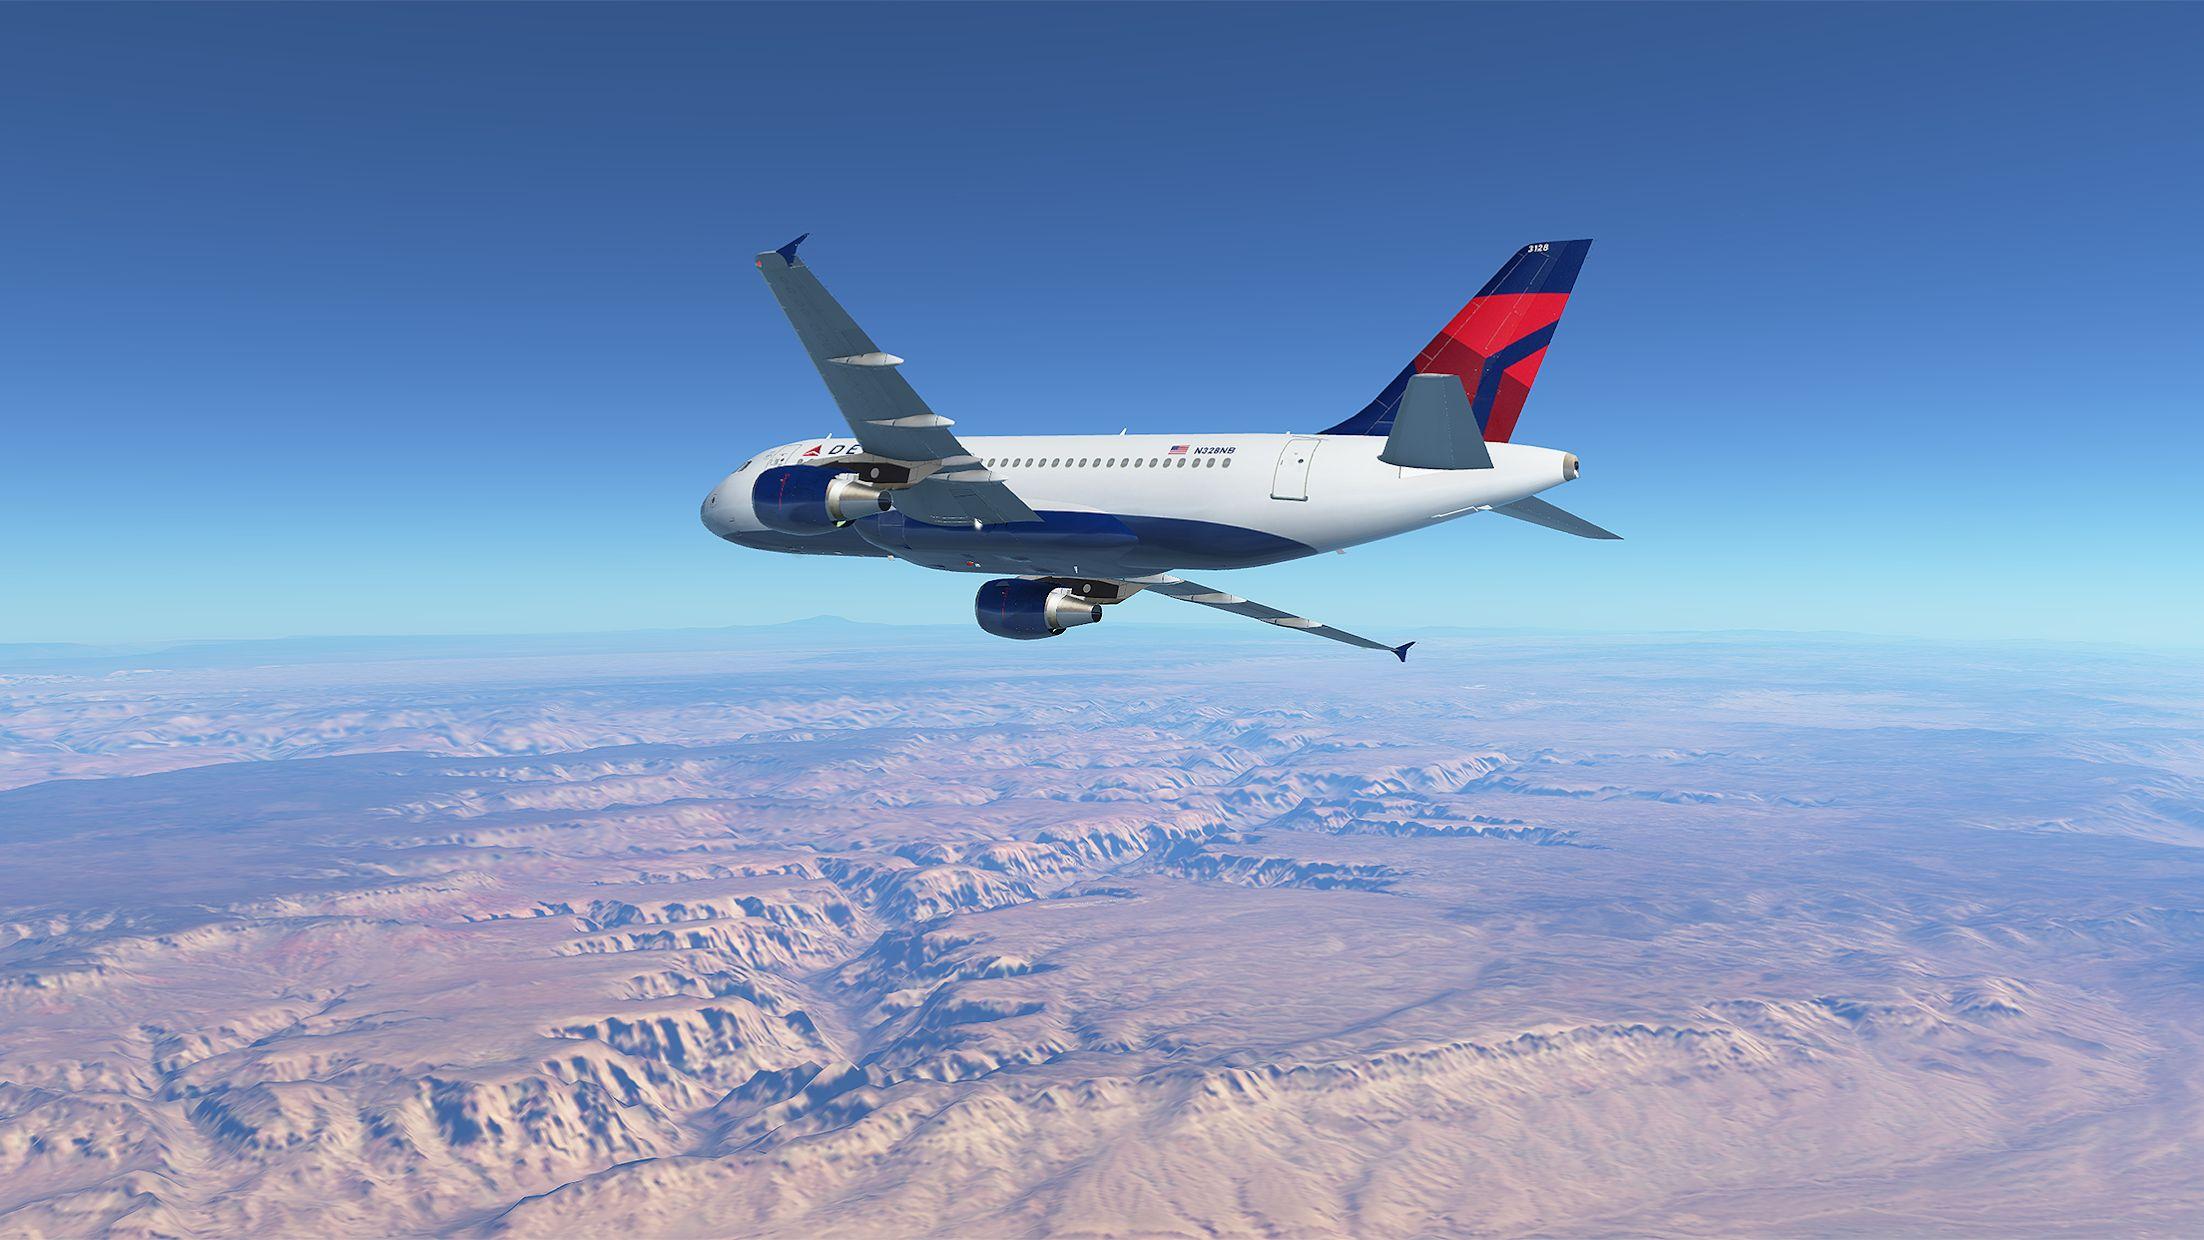 Infinite Flight-飞行模拟器 游戏截图4